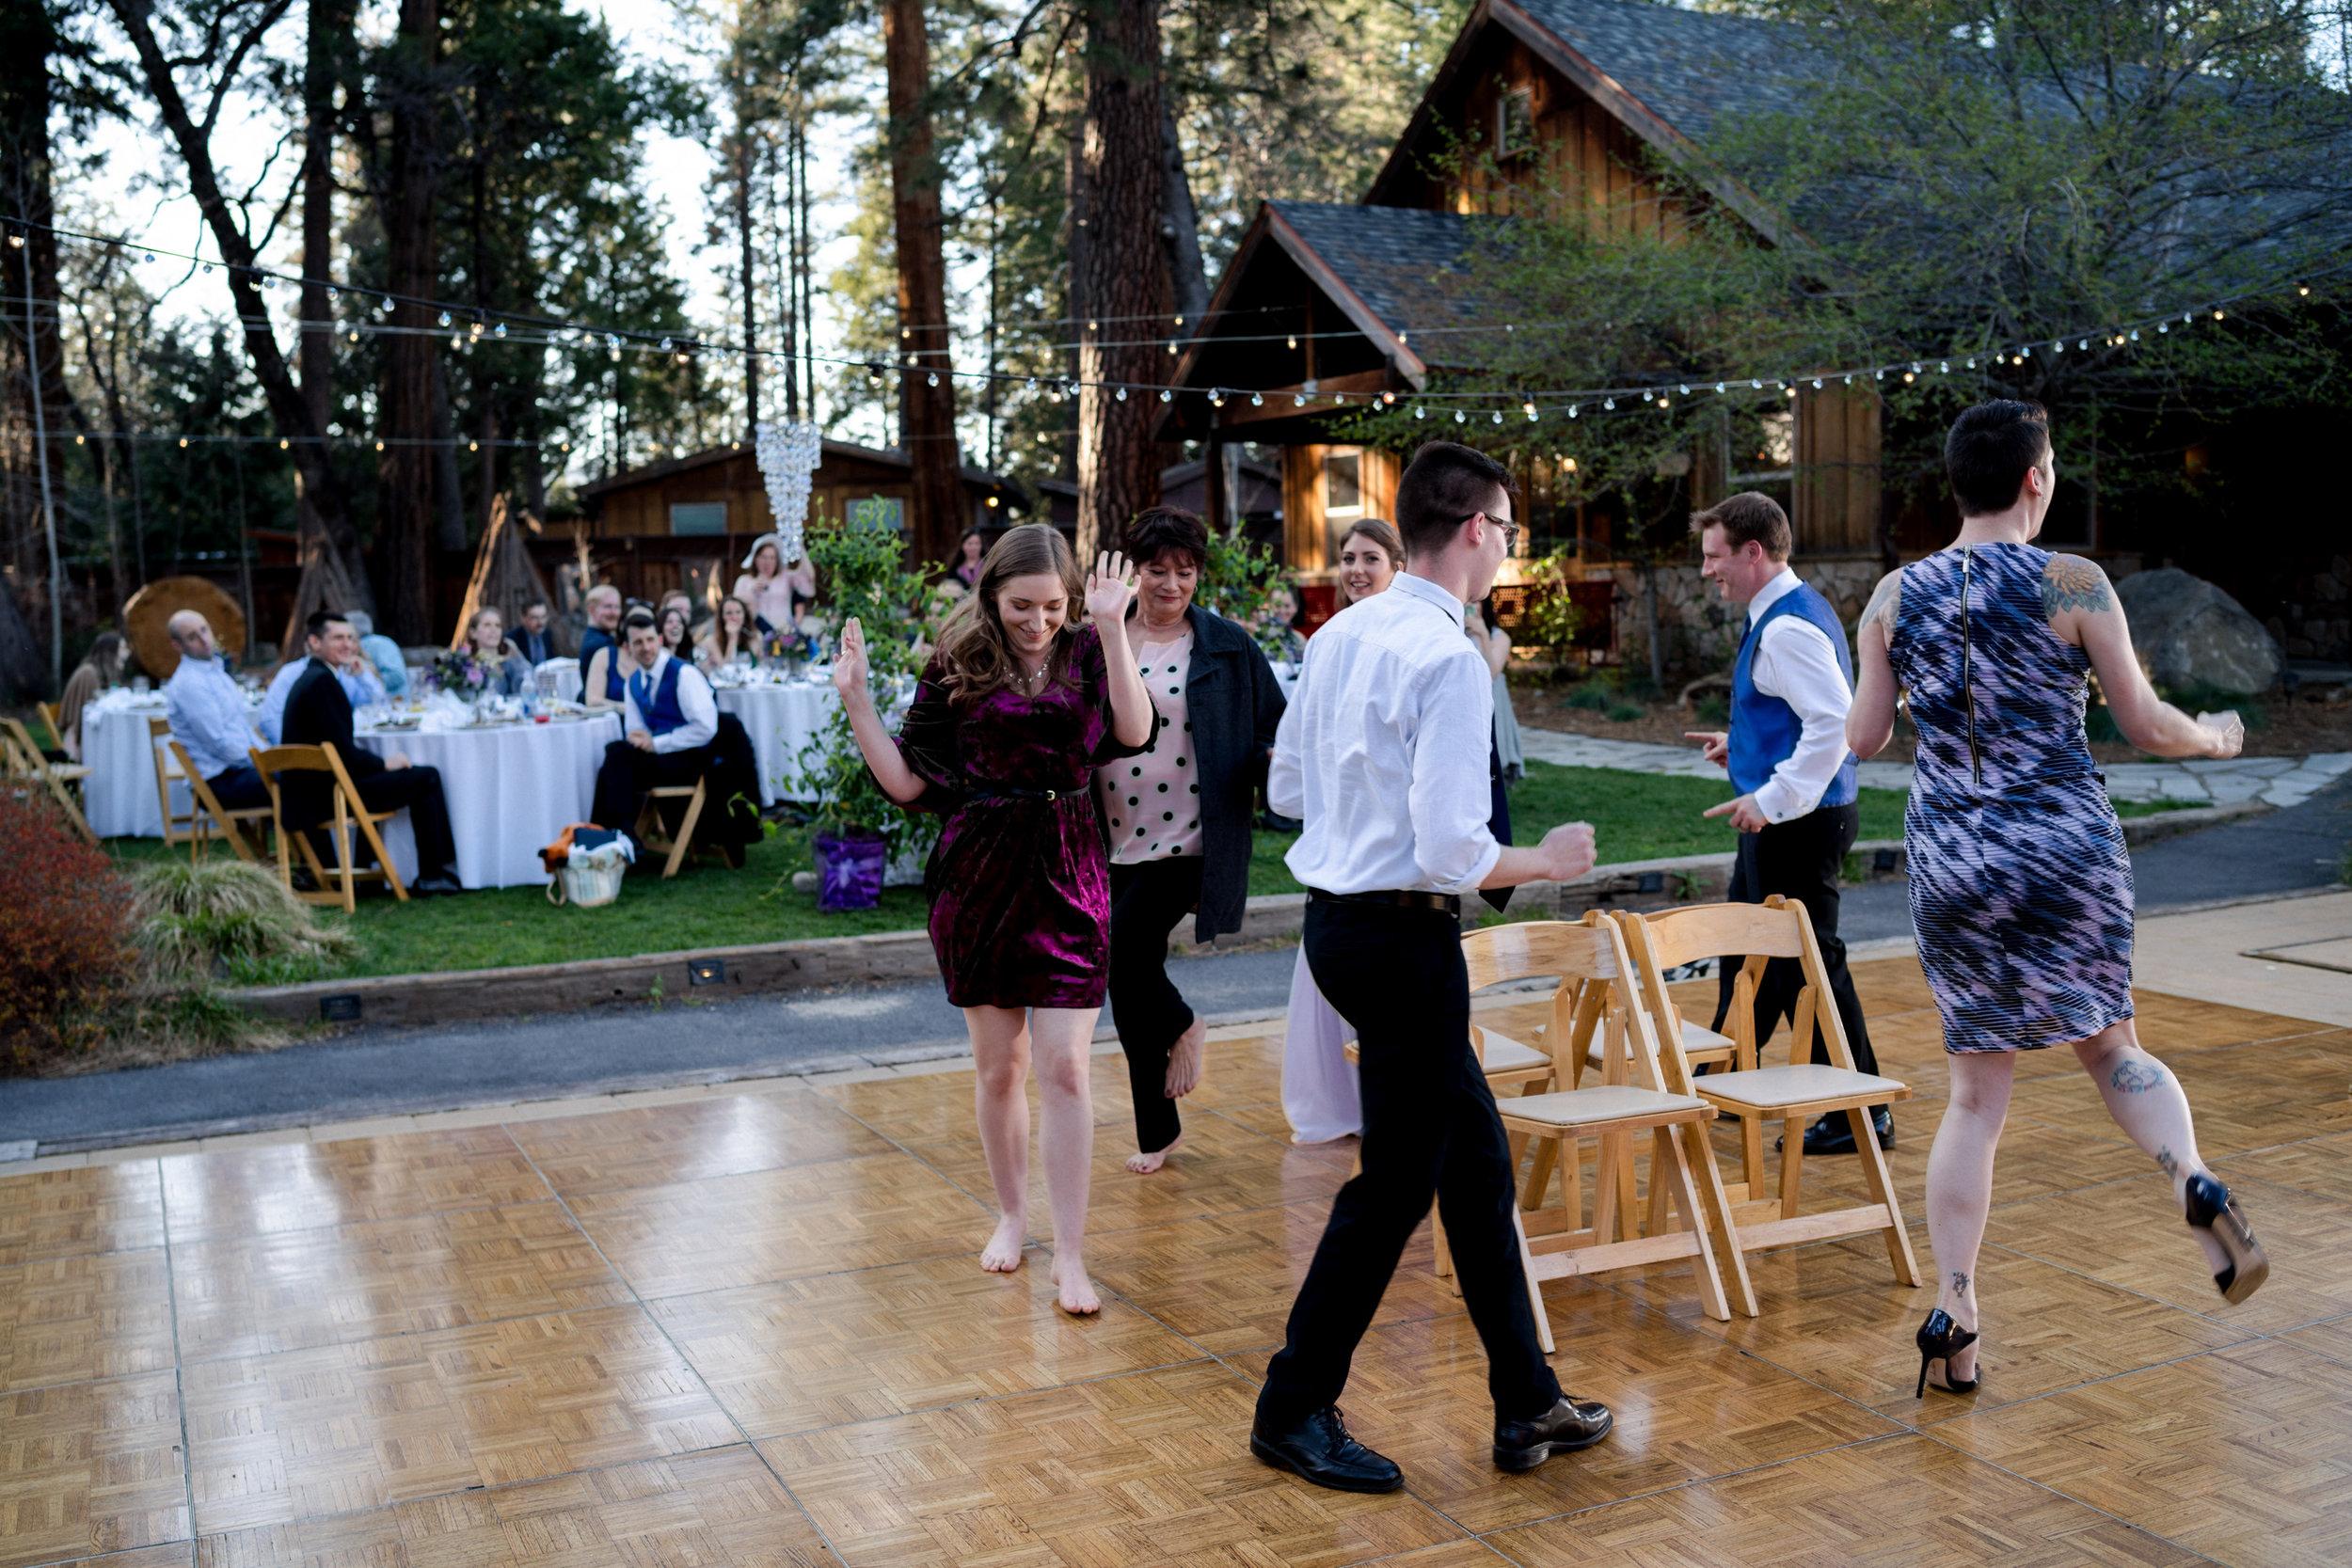 yosemite-evergreen-lodge-wedding-emilychris (9).jpg